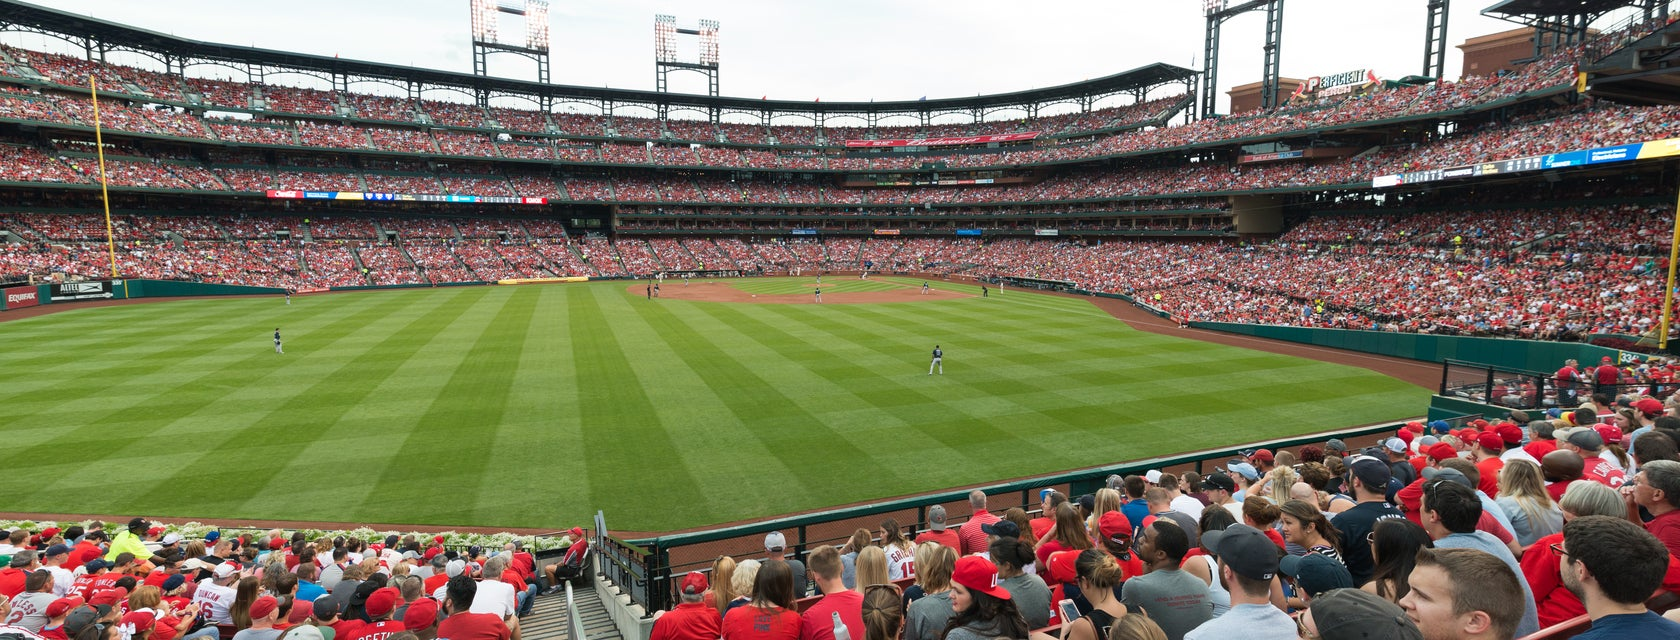 Seat view from Left Field Bleachers